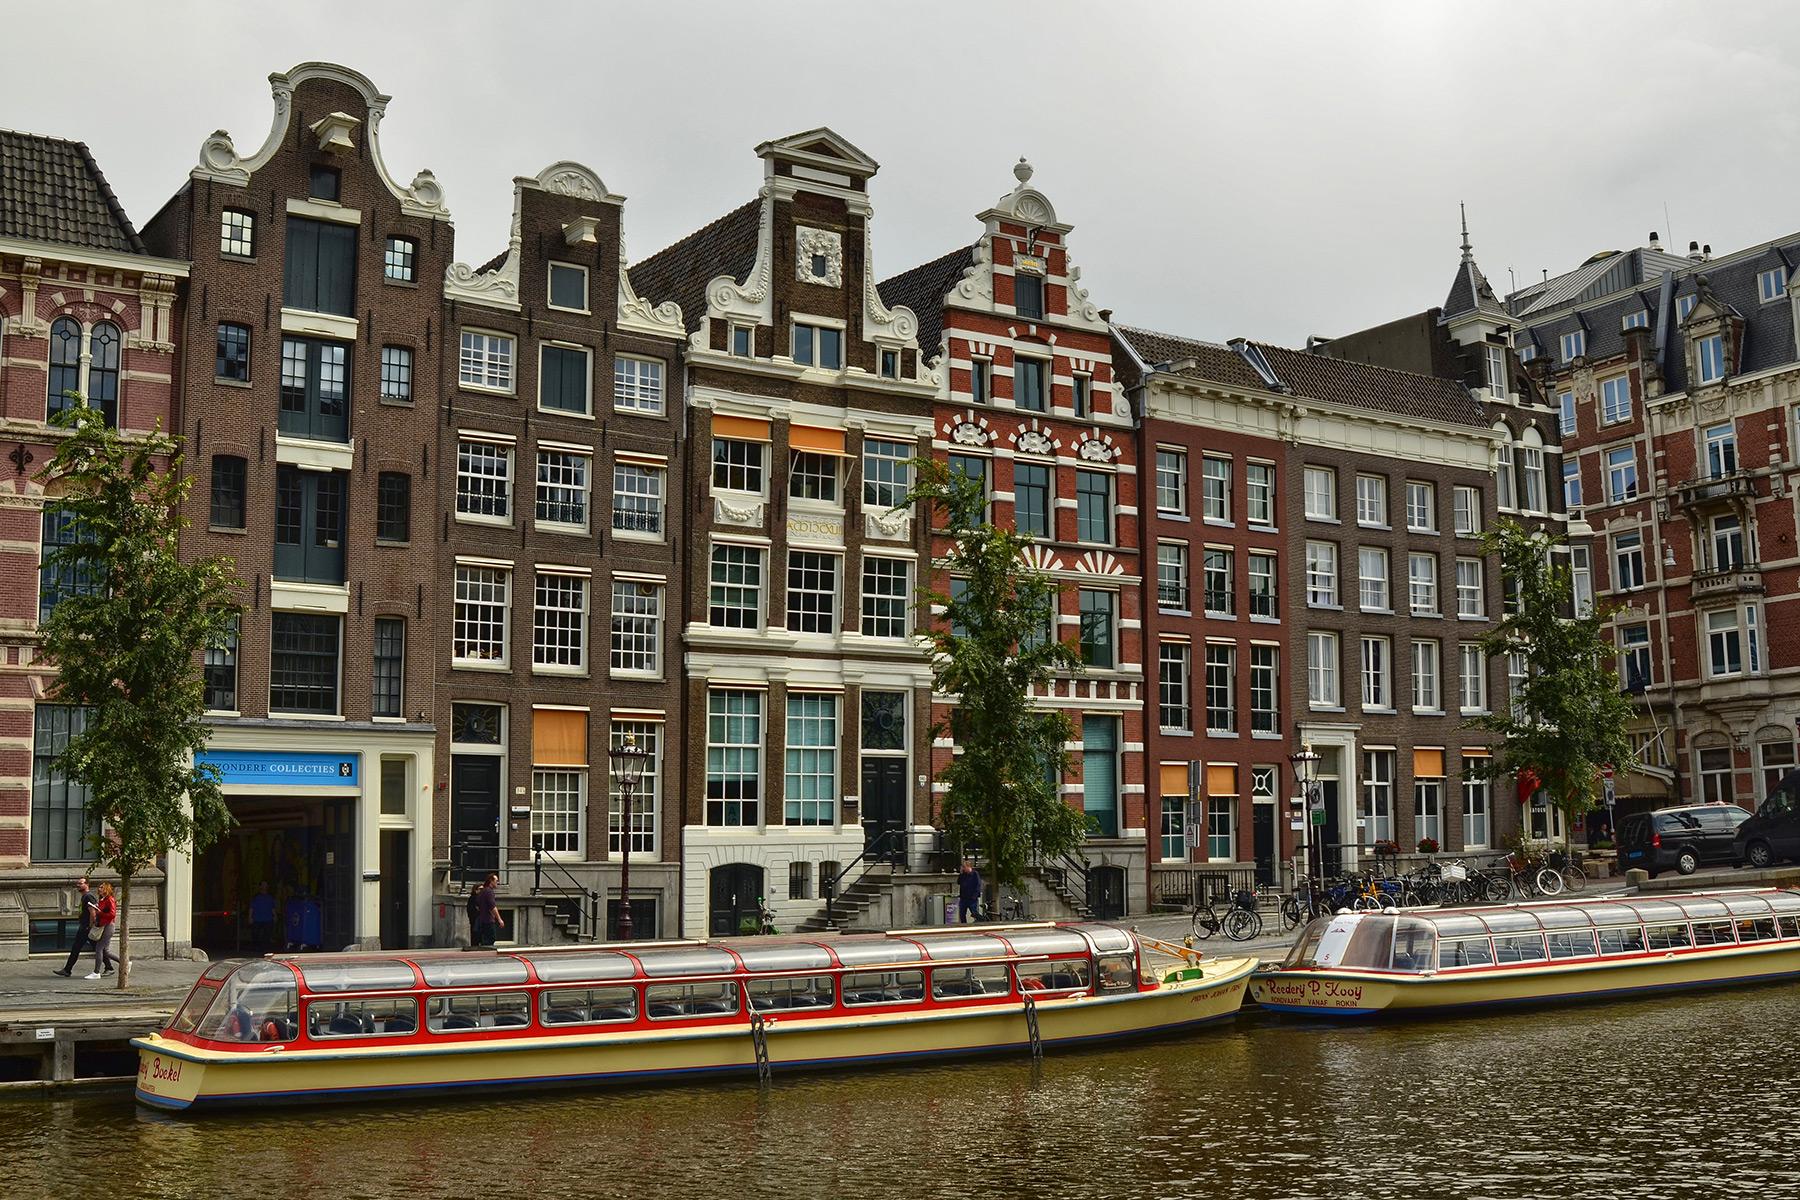 Dutch canal boats